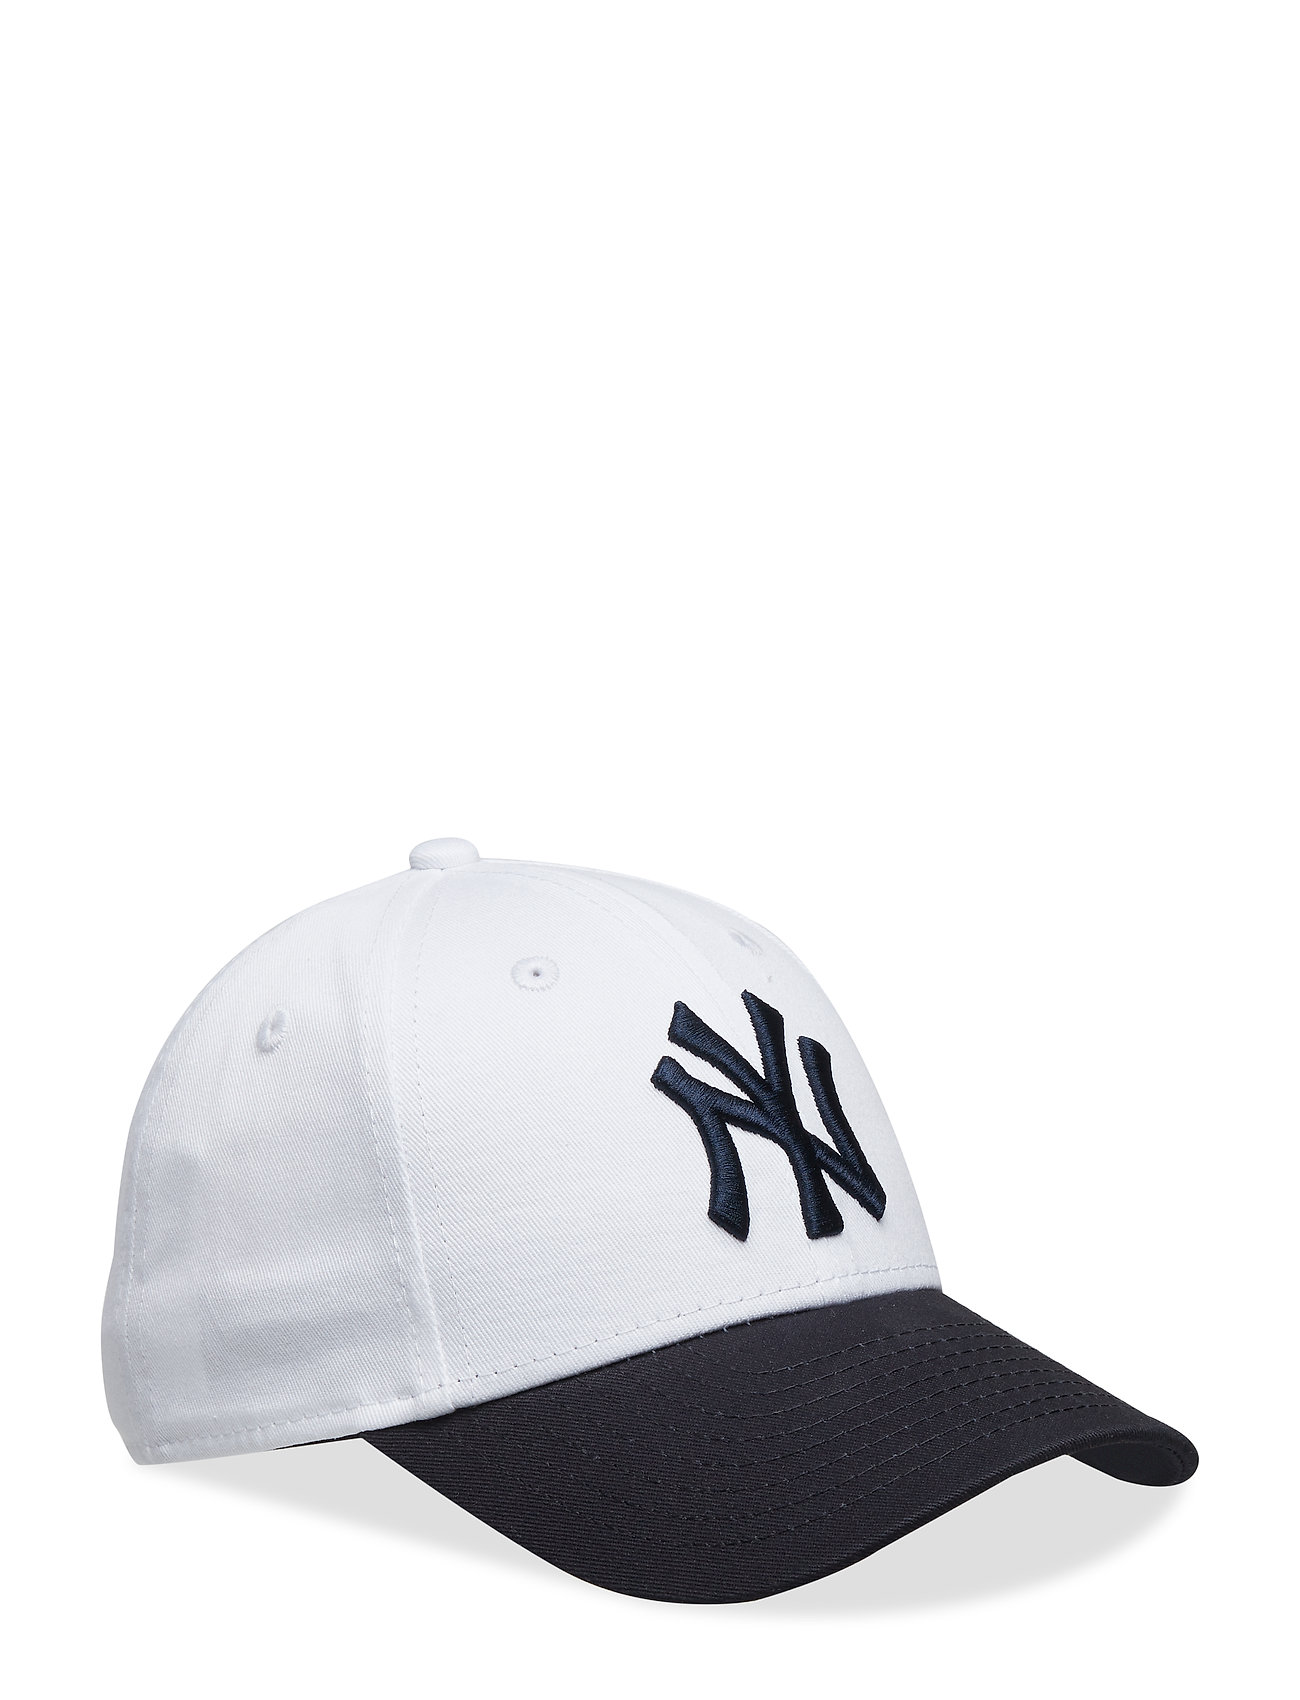 3792991462b4c8 Kids Mlb White Top 9forty Ney (Whinvy) (15 €) - New Era - | Boozt.com